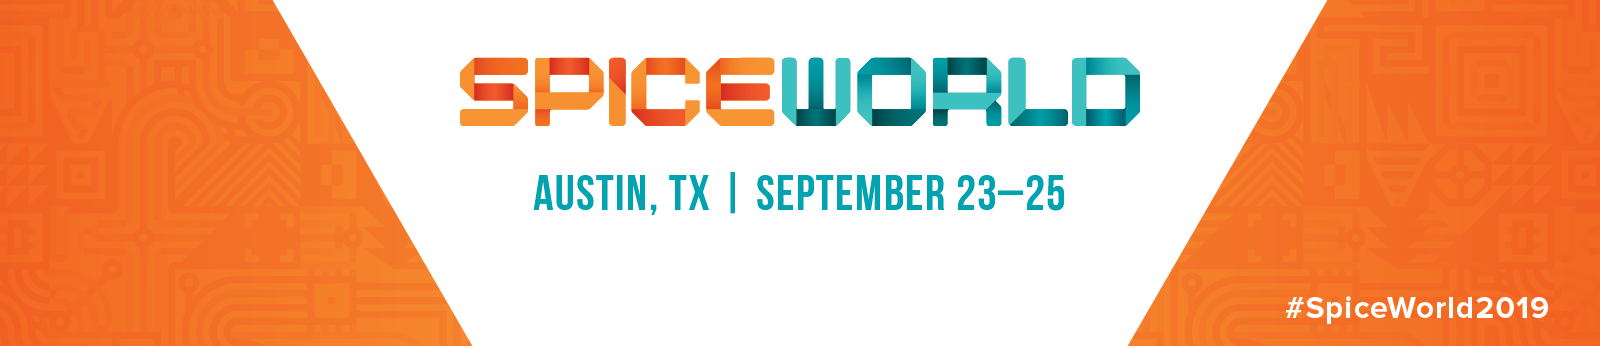 SpiceWorld Austin 2019